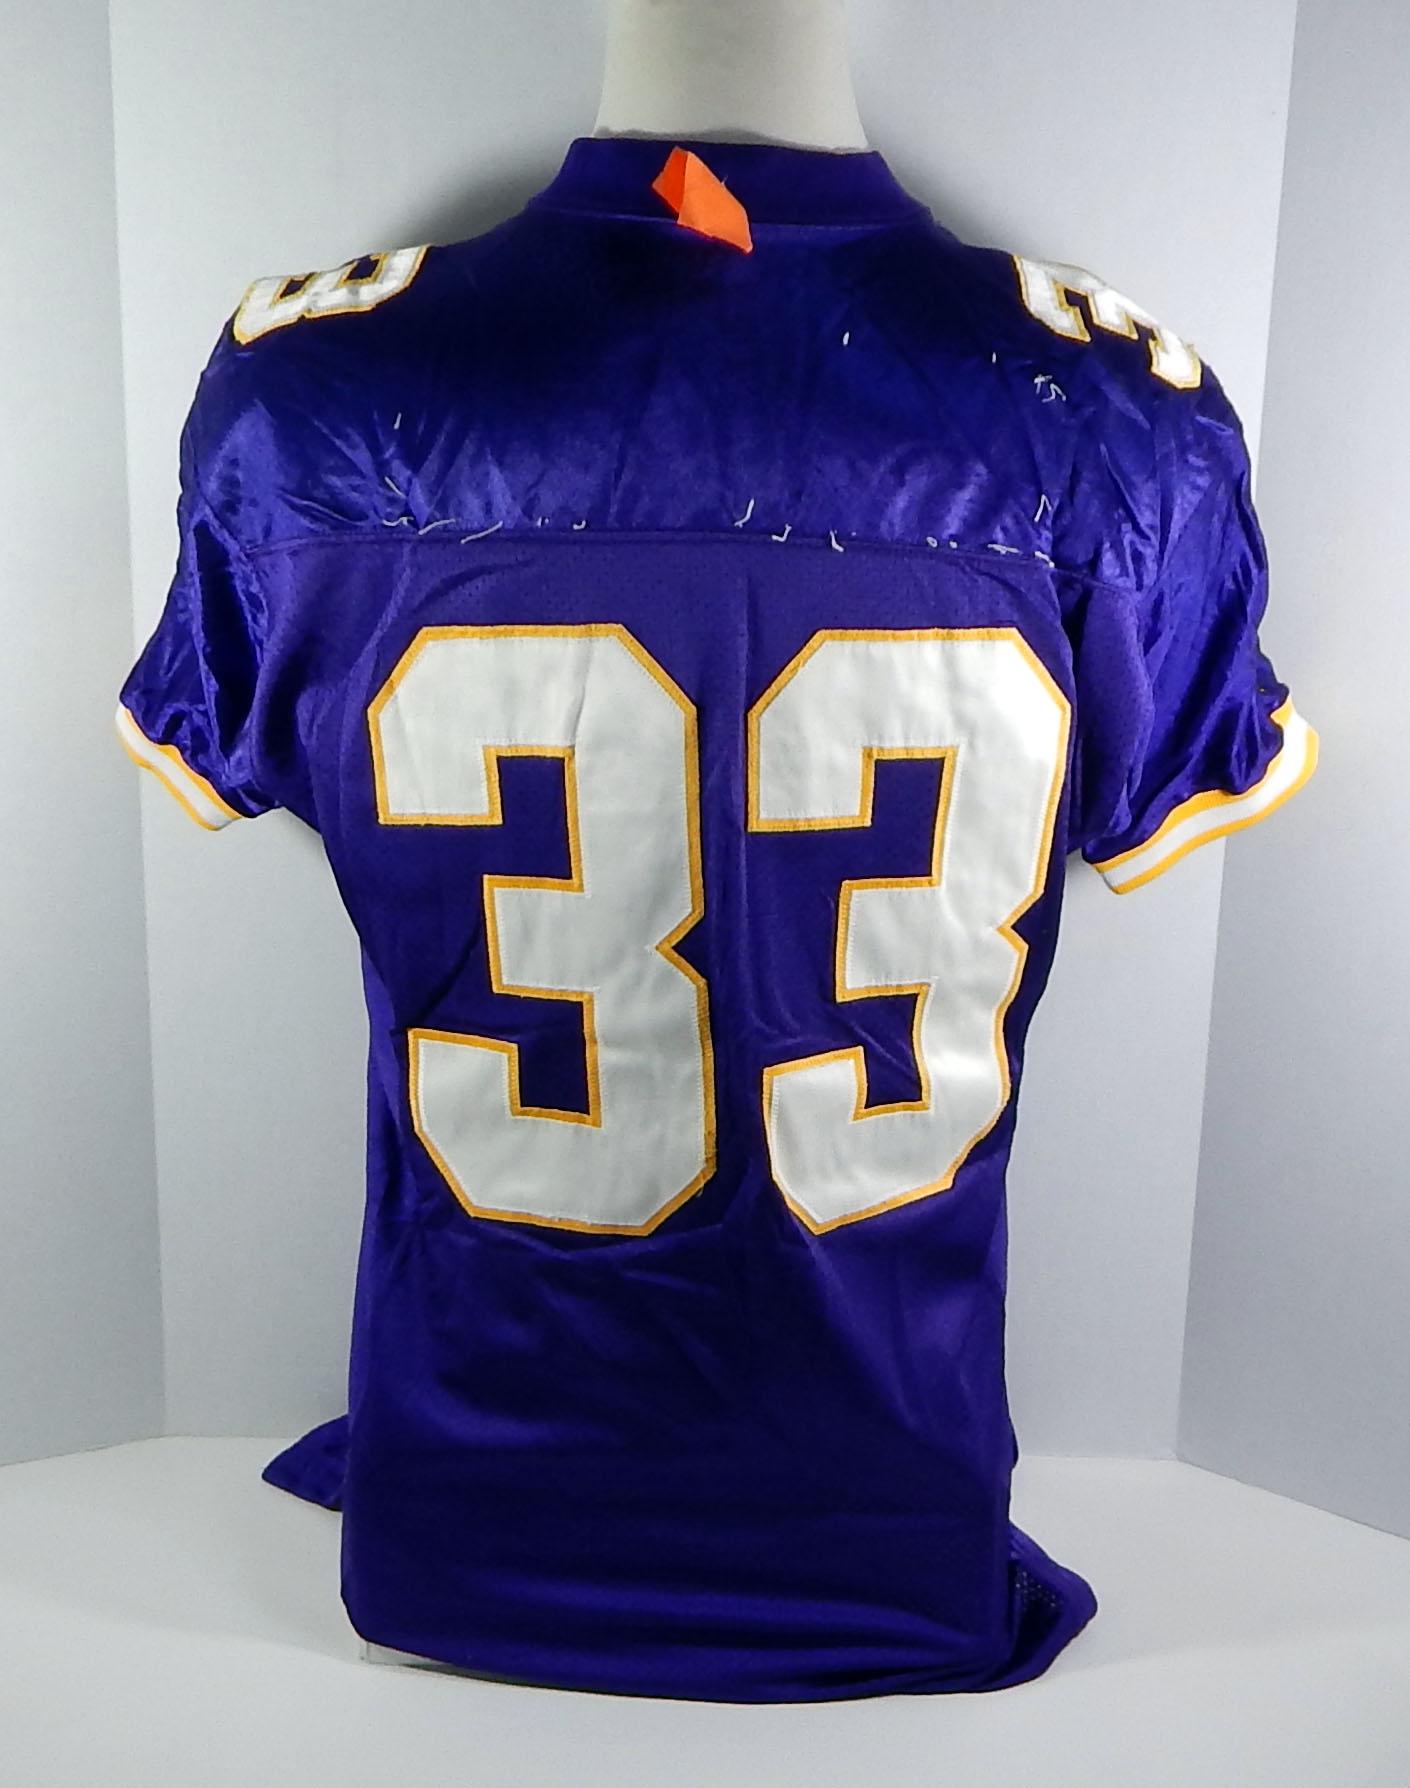 660f3d07 1997 Minnesota Vikings #33 Game Issued Purple Jersey   eBay